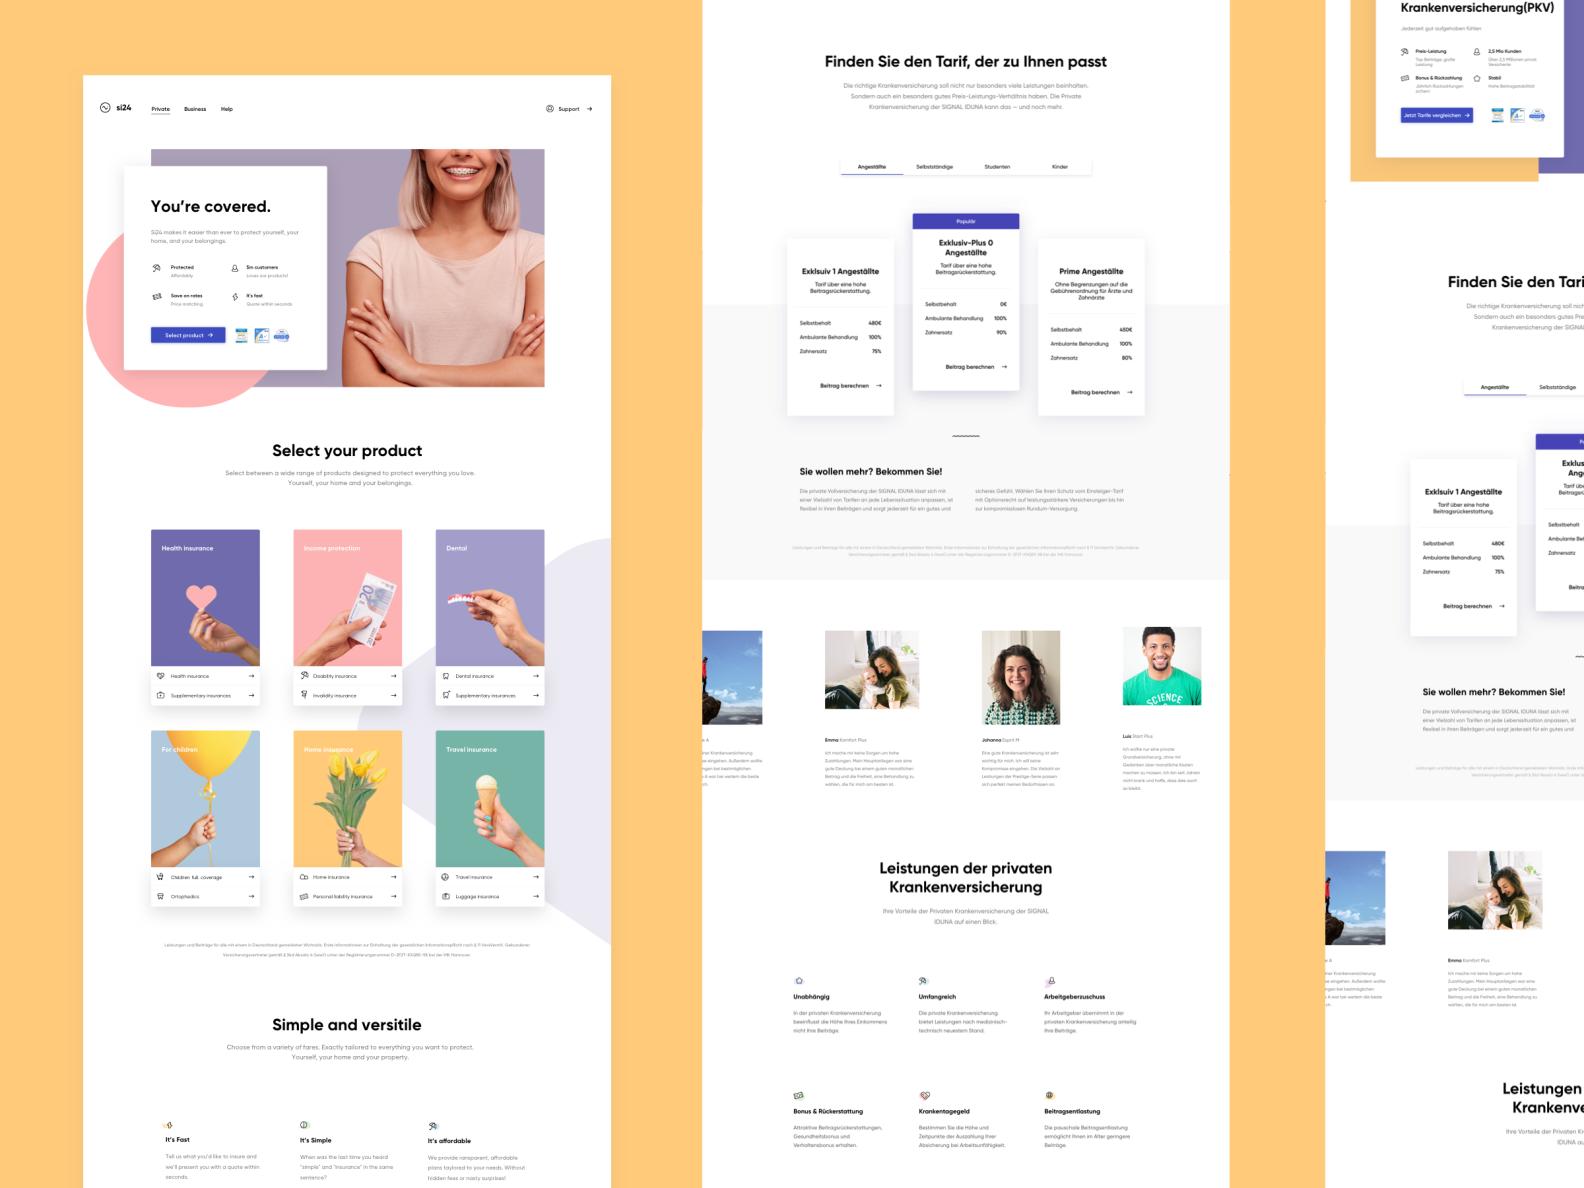 Insurance Made Simple Web Design Design Make It Simple